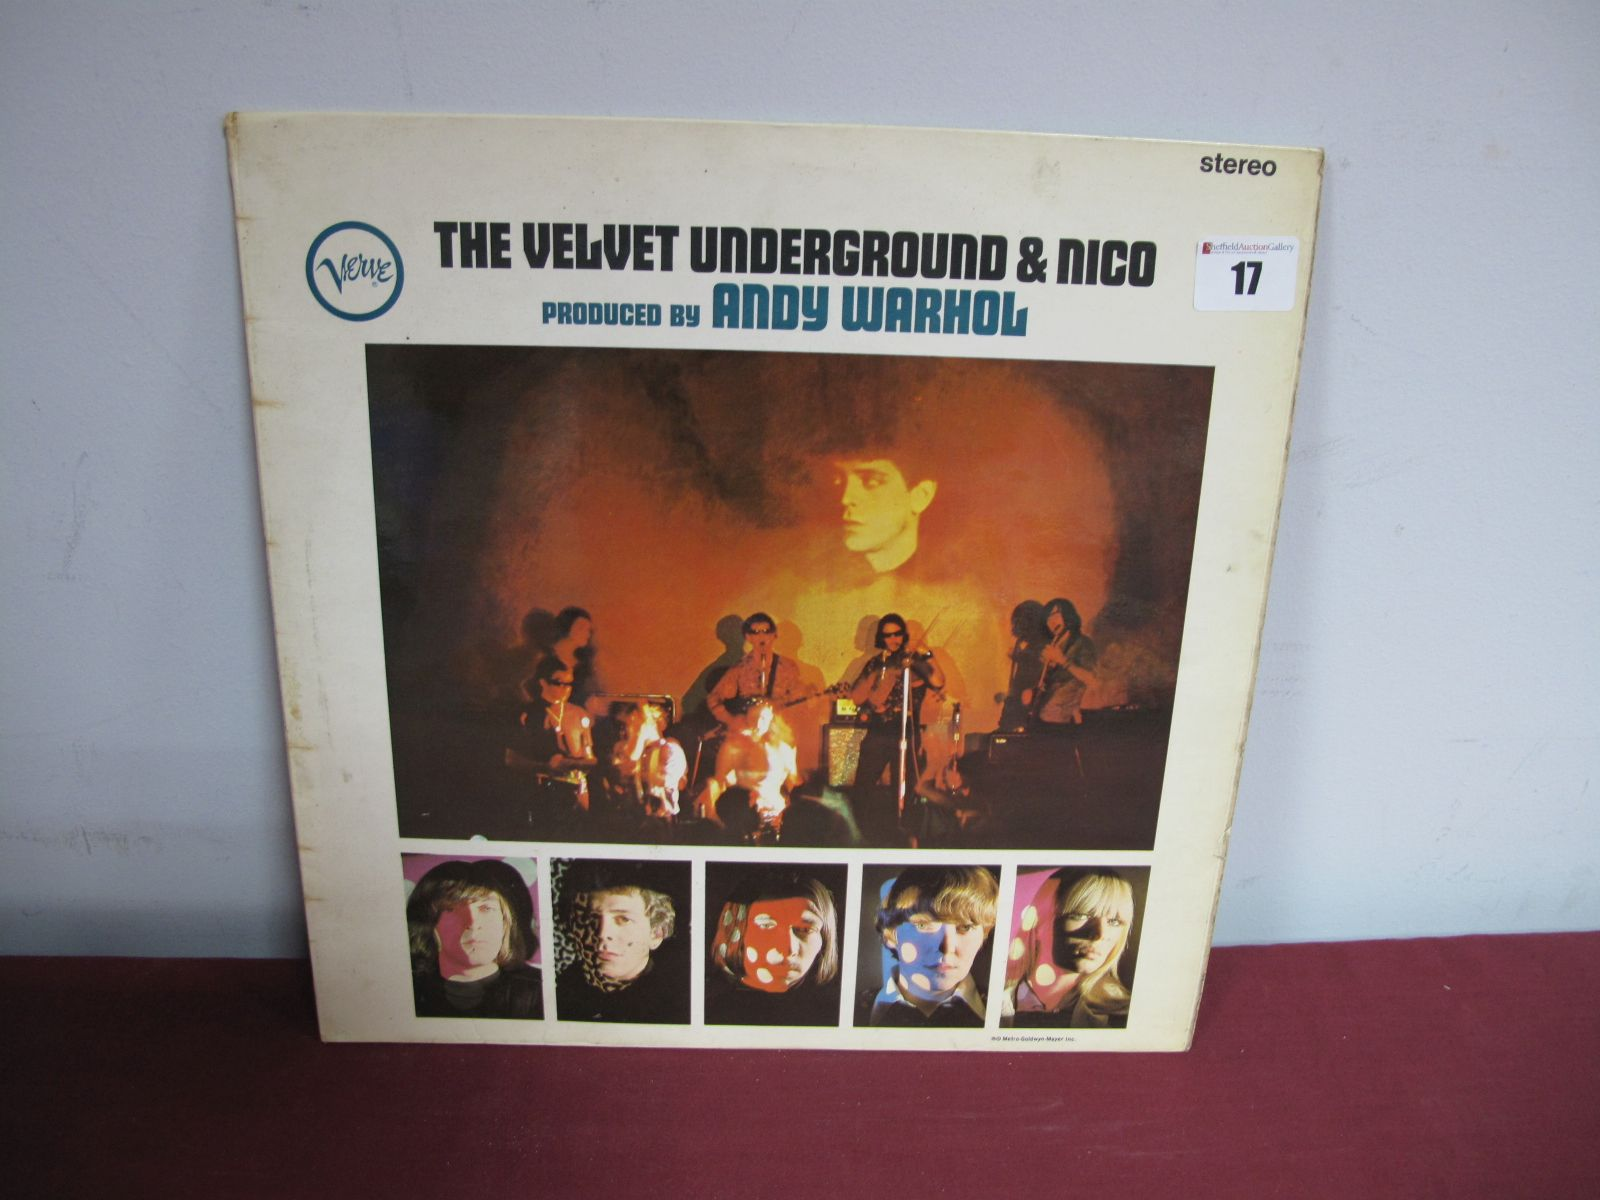 Lot 17 - 'Velvet Underground & Nico' Stereo LP, 1967, (black/silver verve), SVLP 9184, flip back laminated